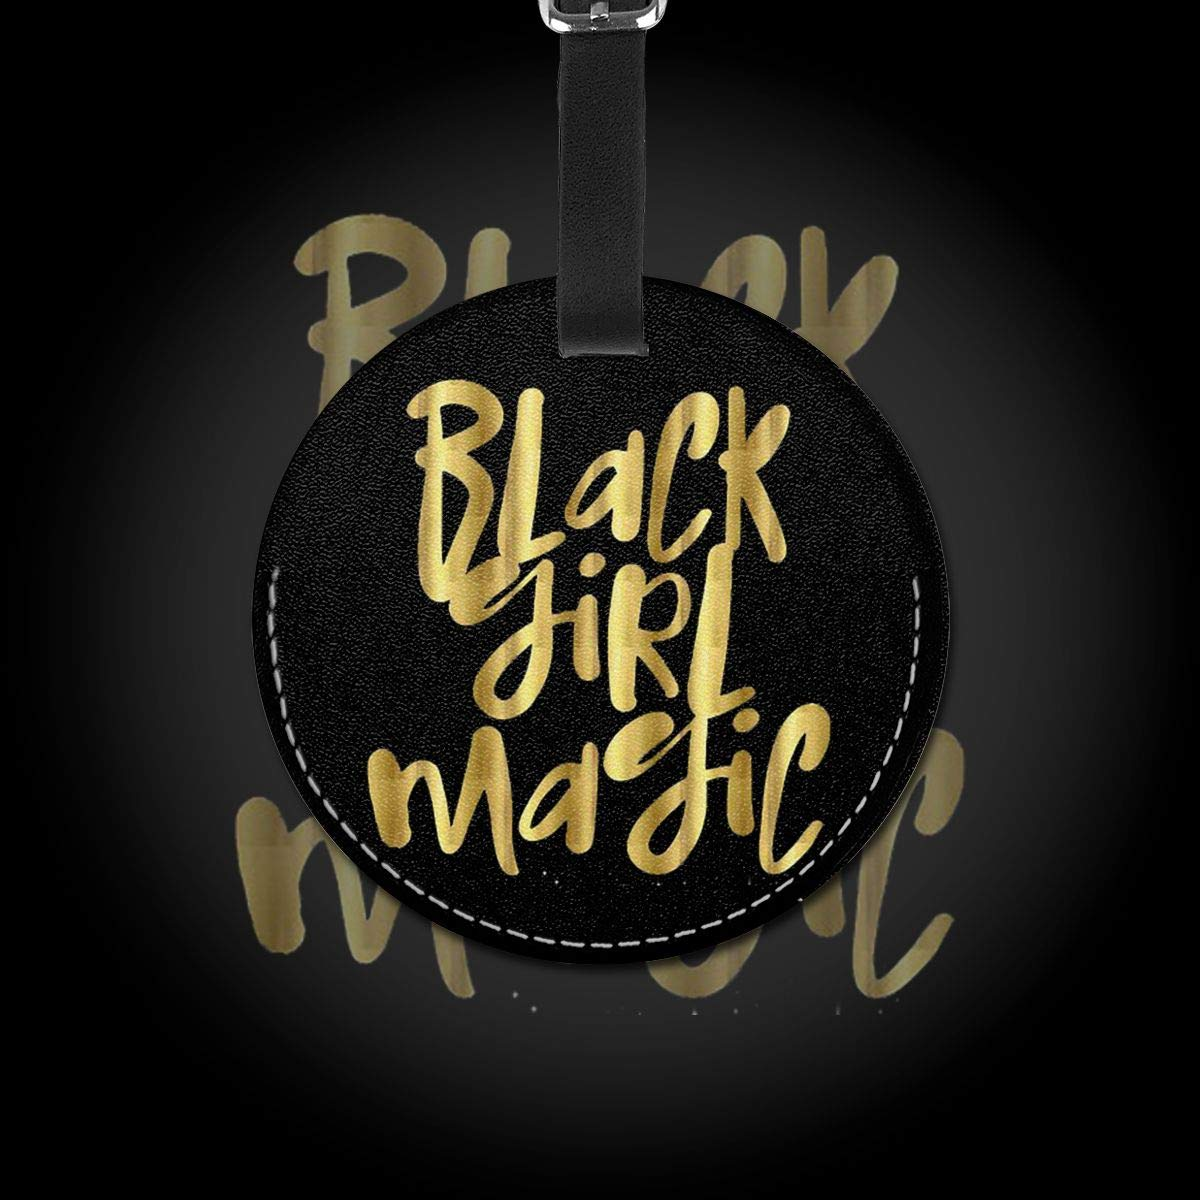 Free-2 Black Girl Magic Logo Luggage Tag 3D Print Leather Travel Bag ID Card